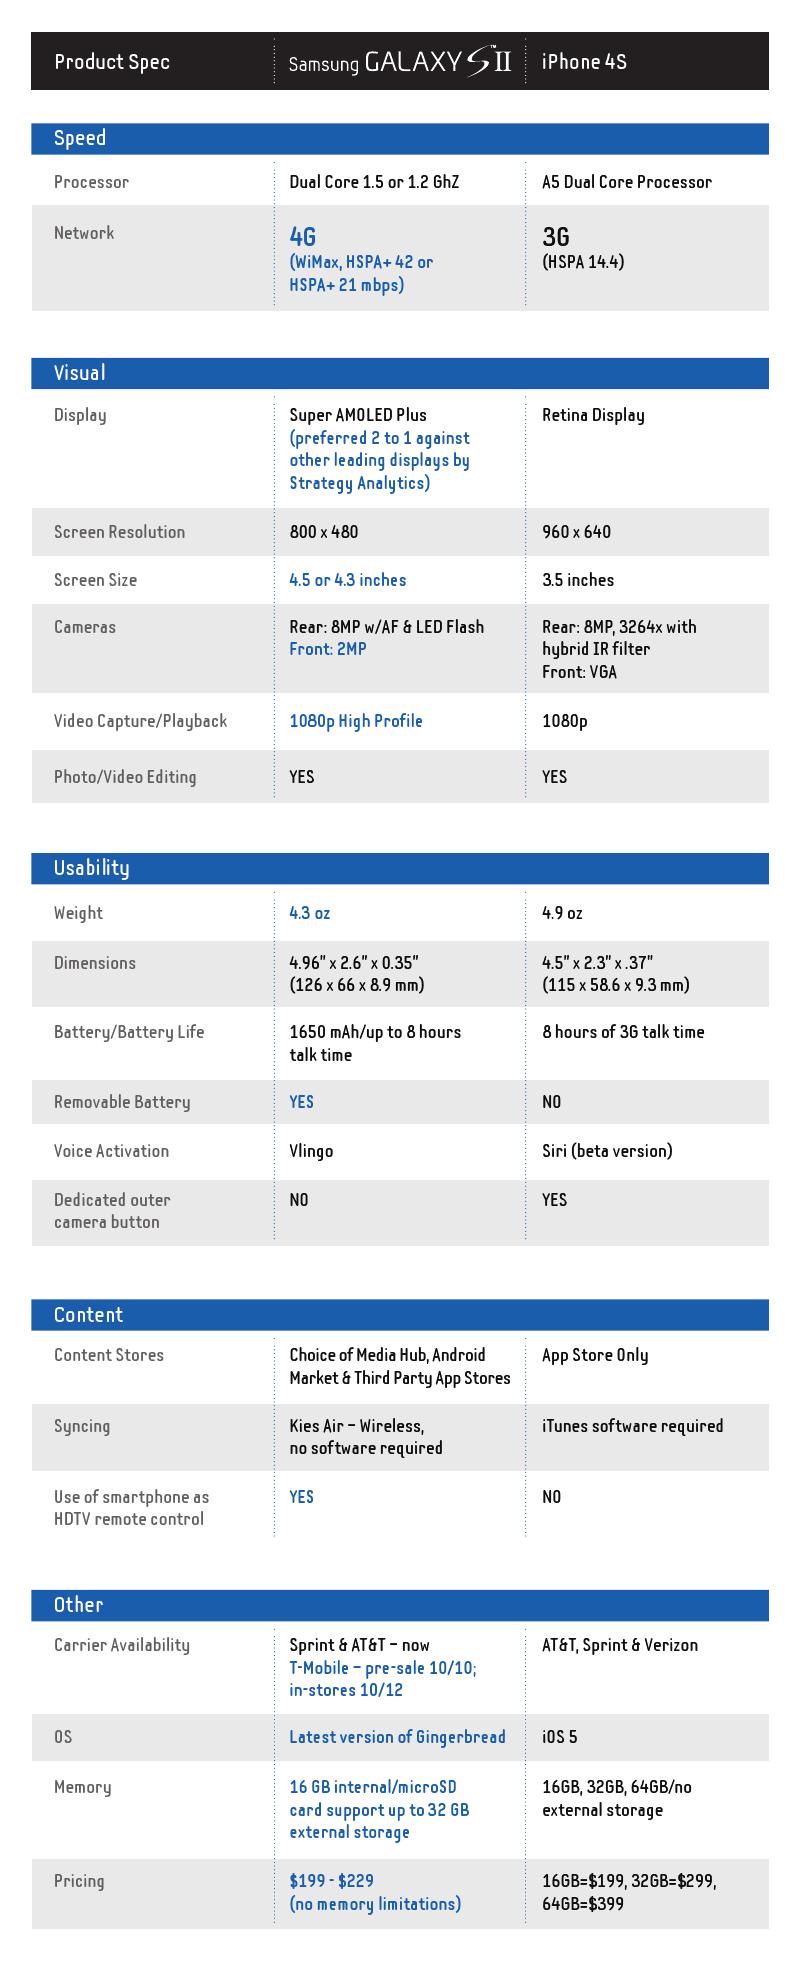 Samsung-Galaxy-S-II-vs-iPhone-4S